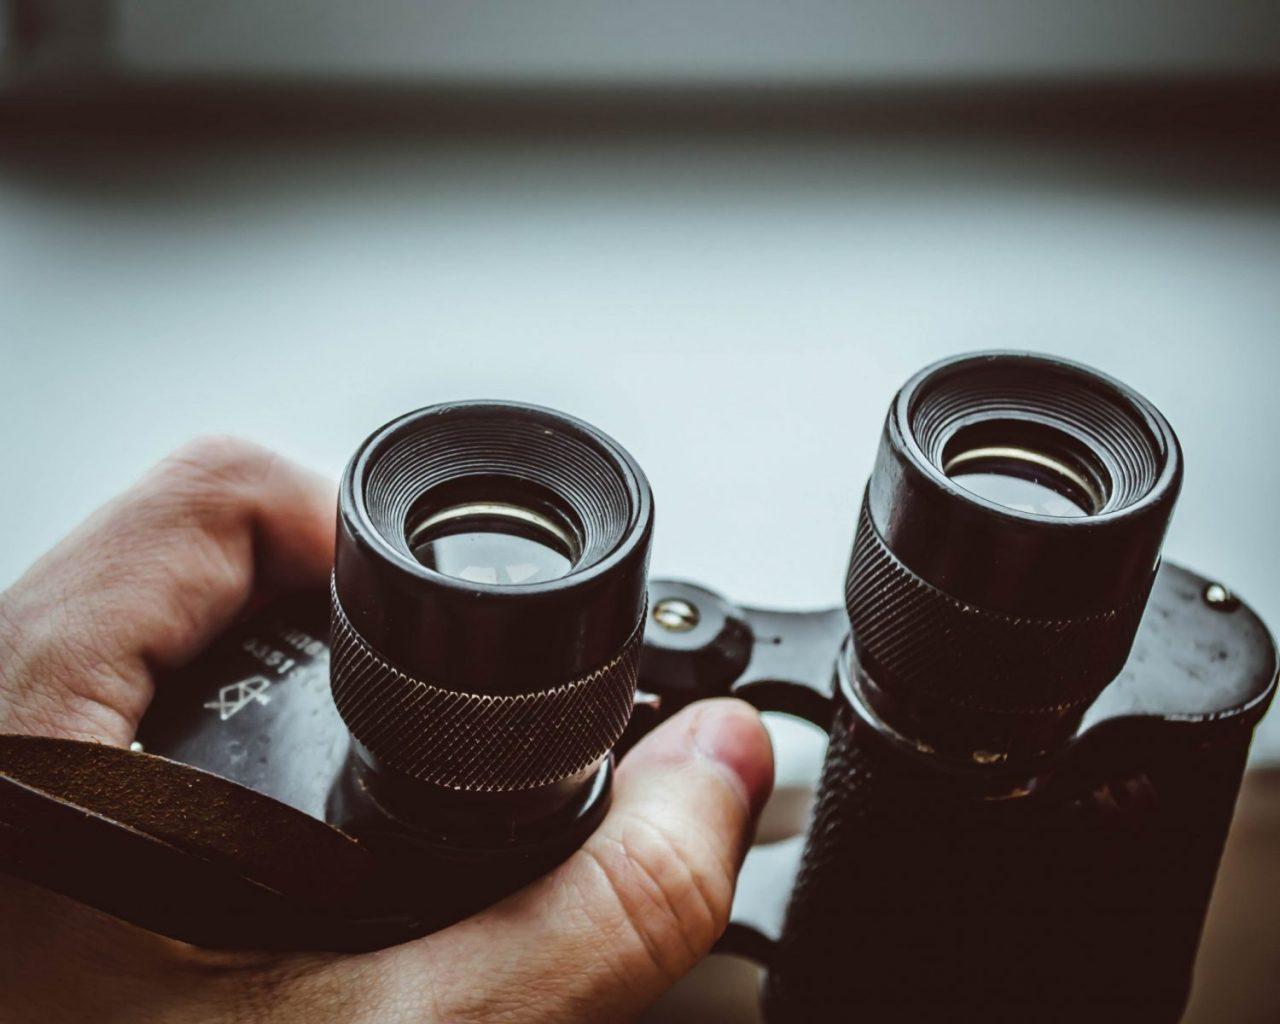 binoculars to bring on a cruise